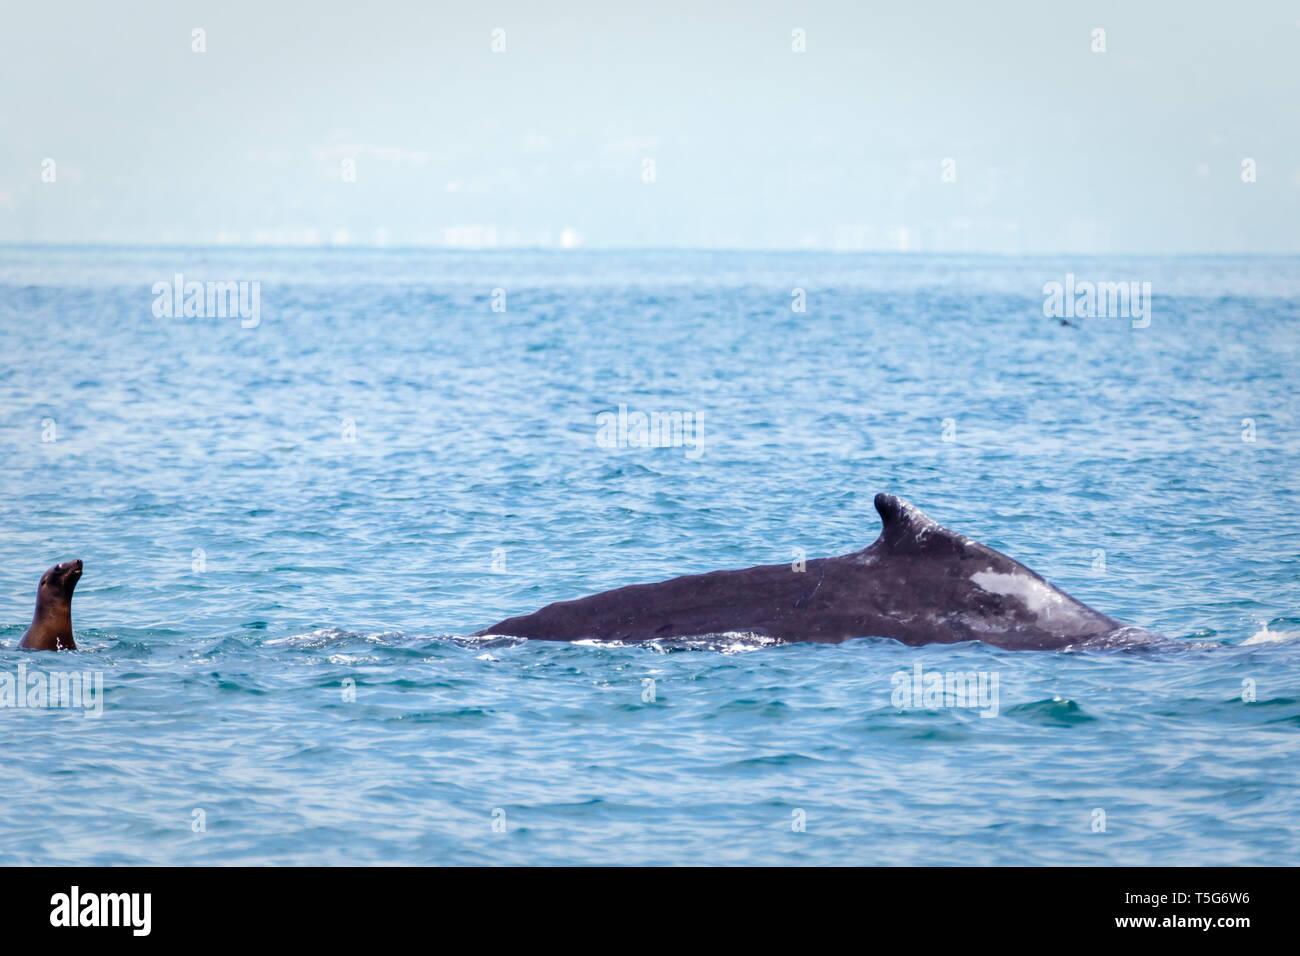 Closeup of California sea lion swimming above a gray whale off the coast - Stock Image